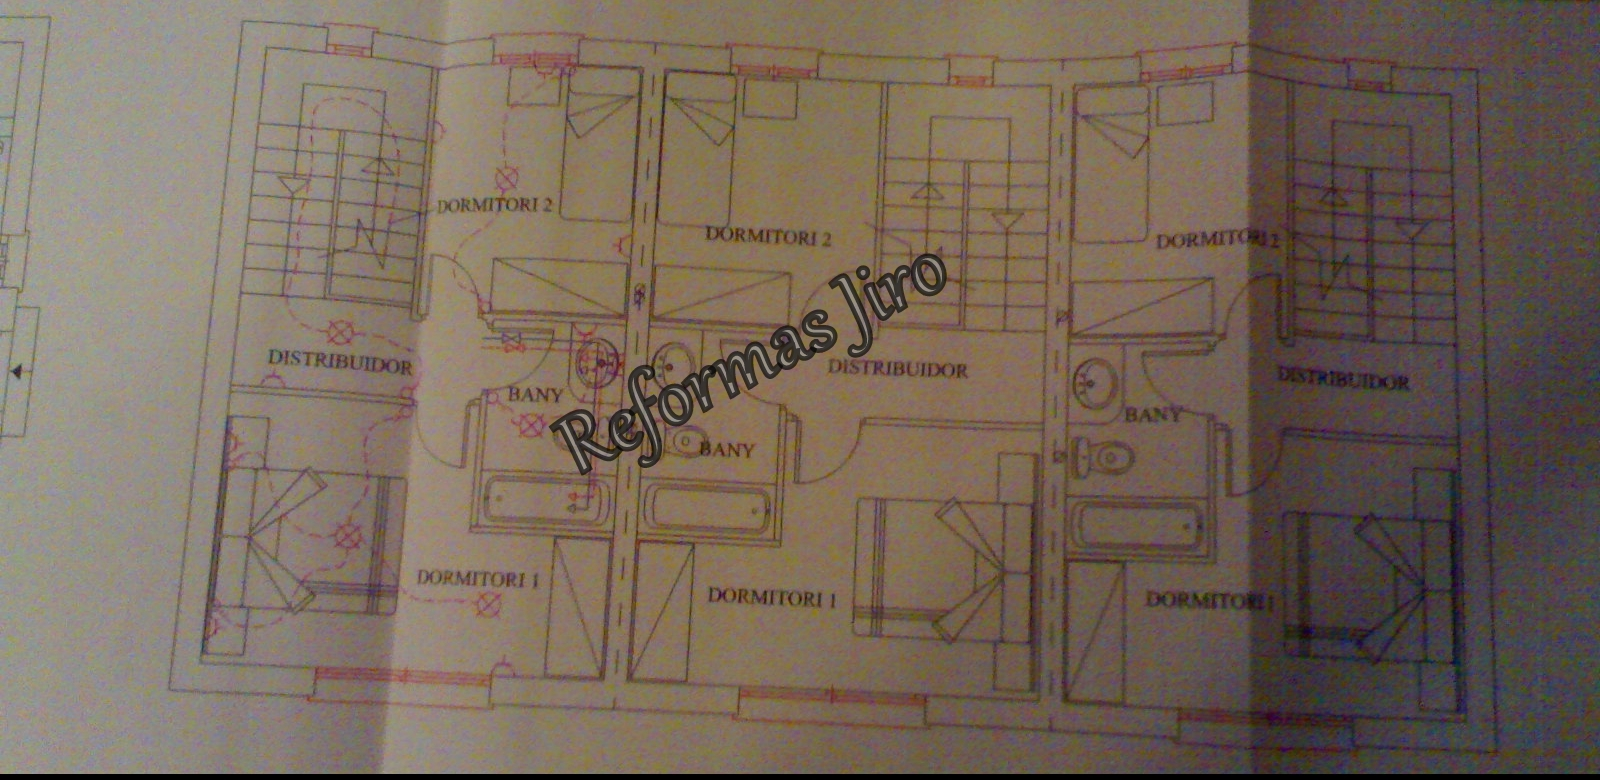 preise f r ihre villa in spanien quiero reformar mi casa. Black Bedroom Furniture Sets. Home Design Ideas